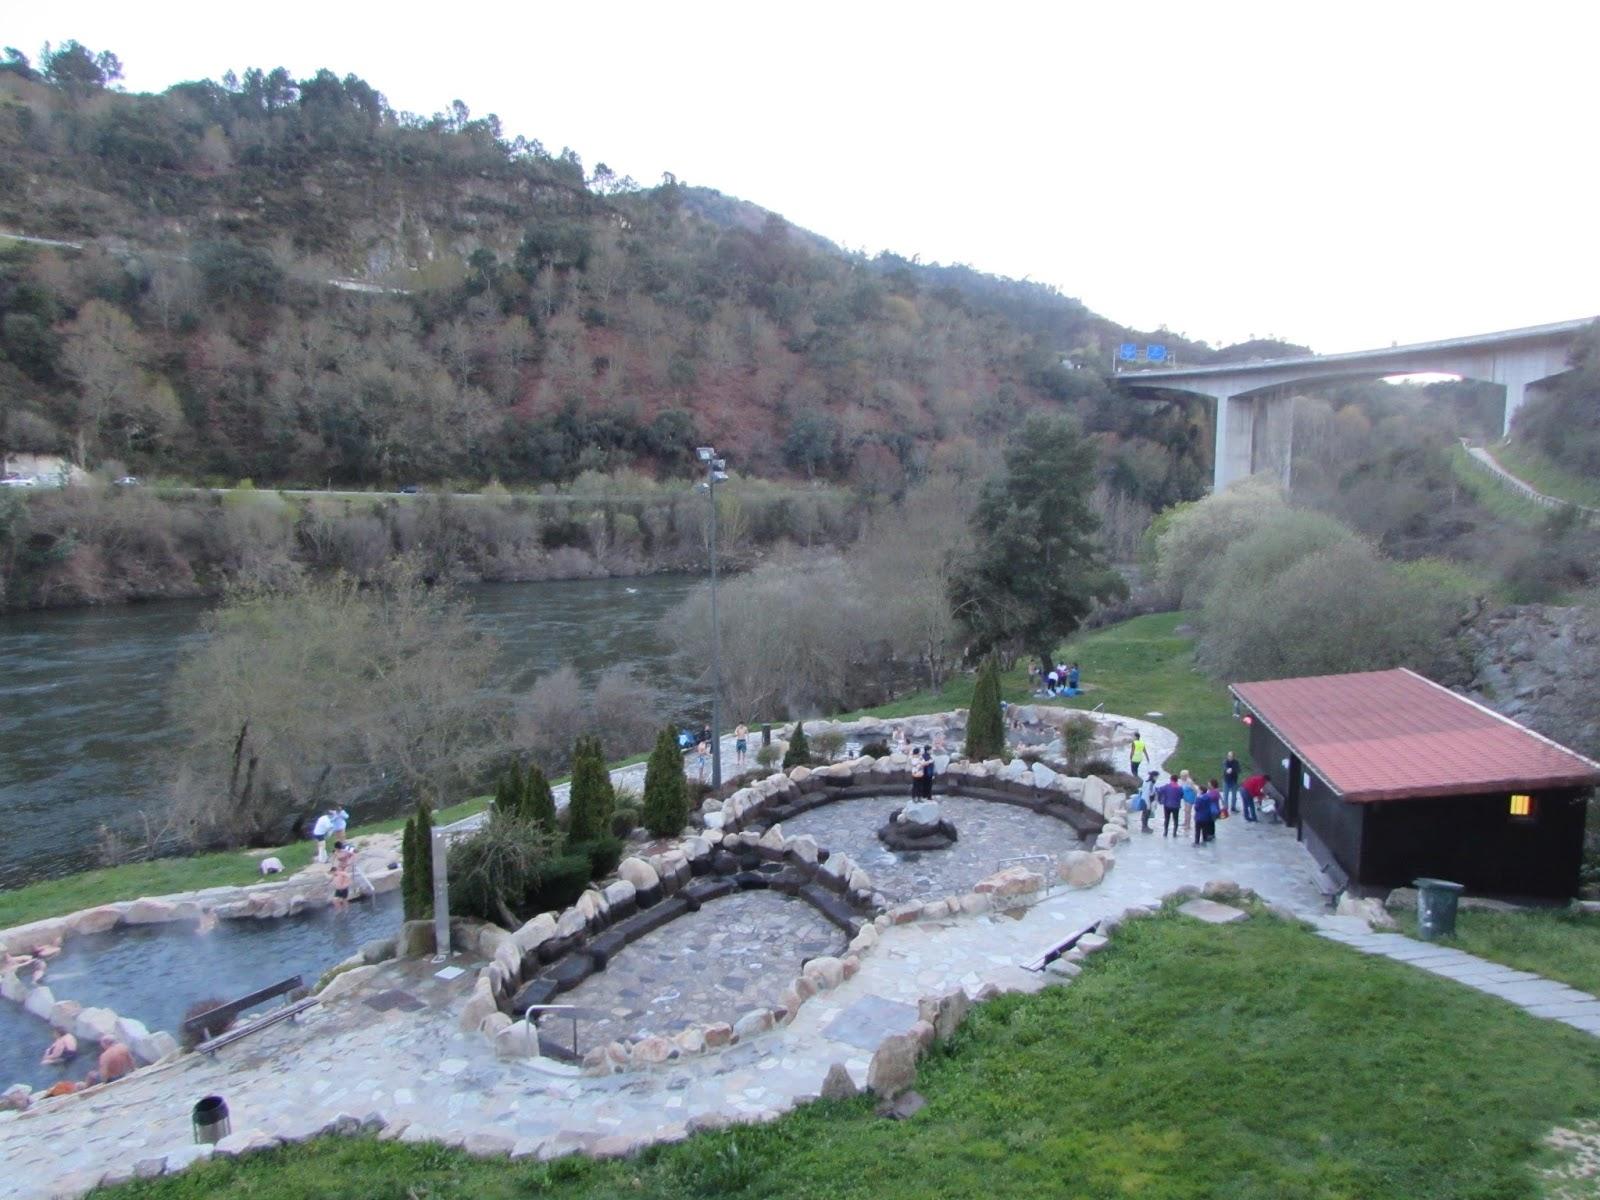 Las 5 piscinas naturales para perderse en galicia vigopeques for Aguas termales naturales madrid